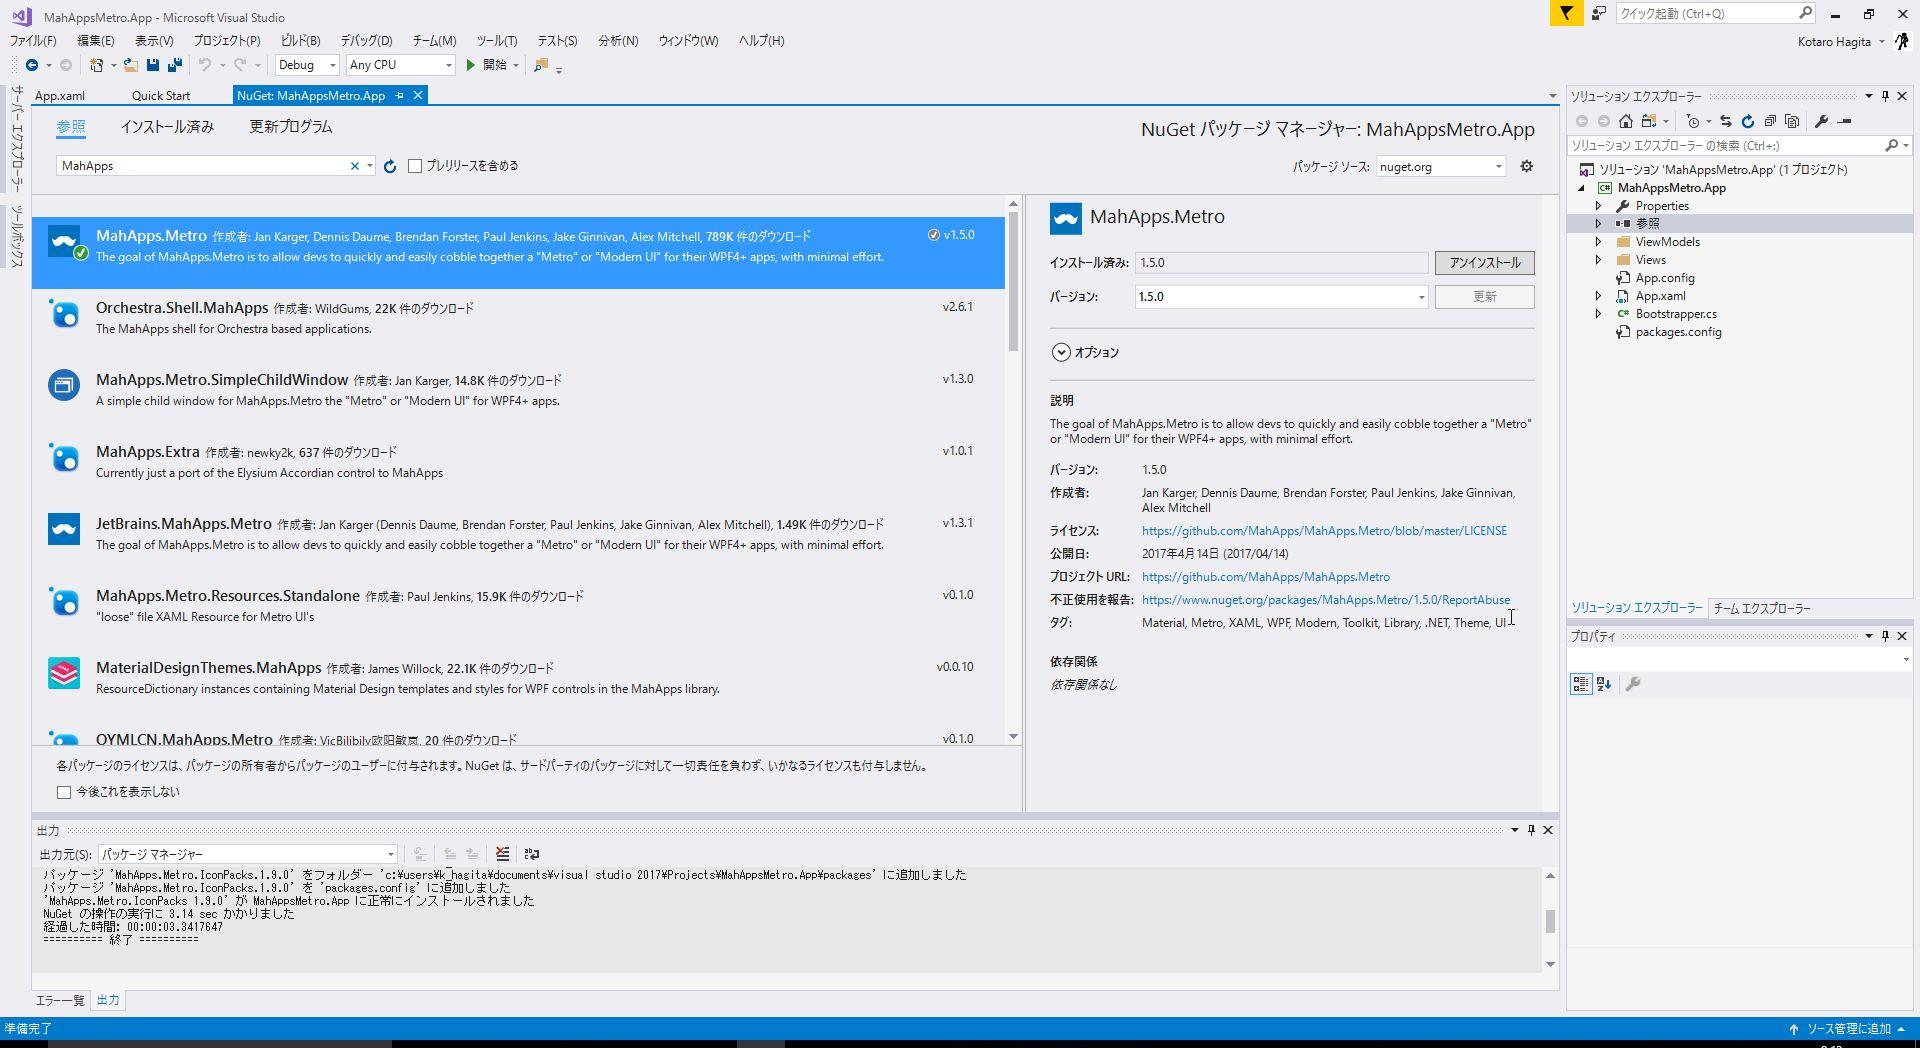 WPF][XAML]MahApps Metroのタイルコントロールを使ったメニュー